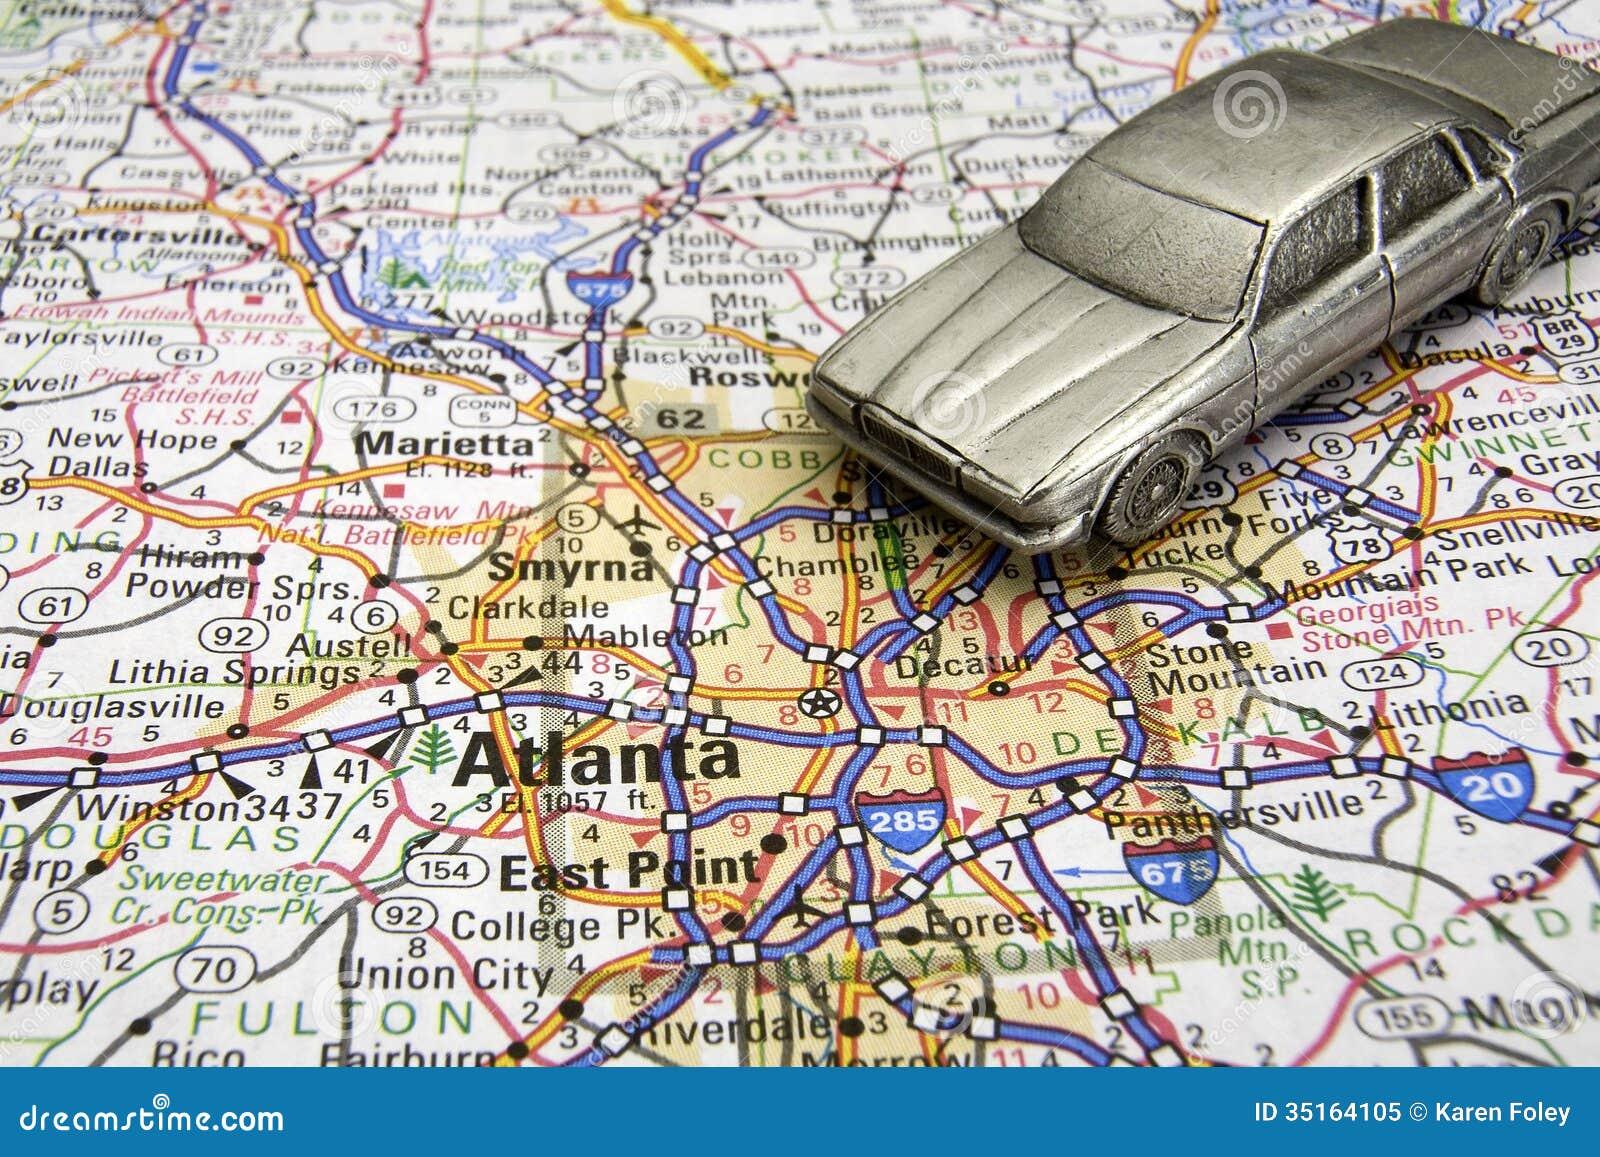 Driving Map Of Georgia.Driving In Atlanta Stock Image Image Of Georgia Auto